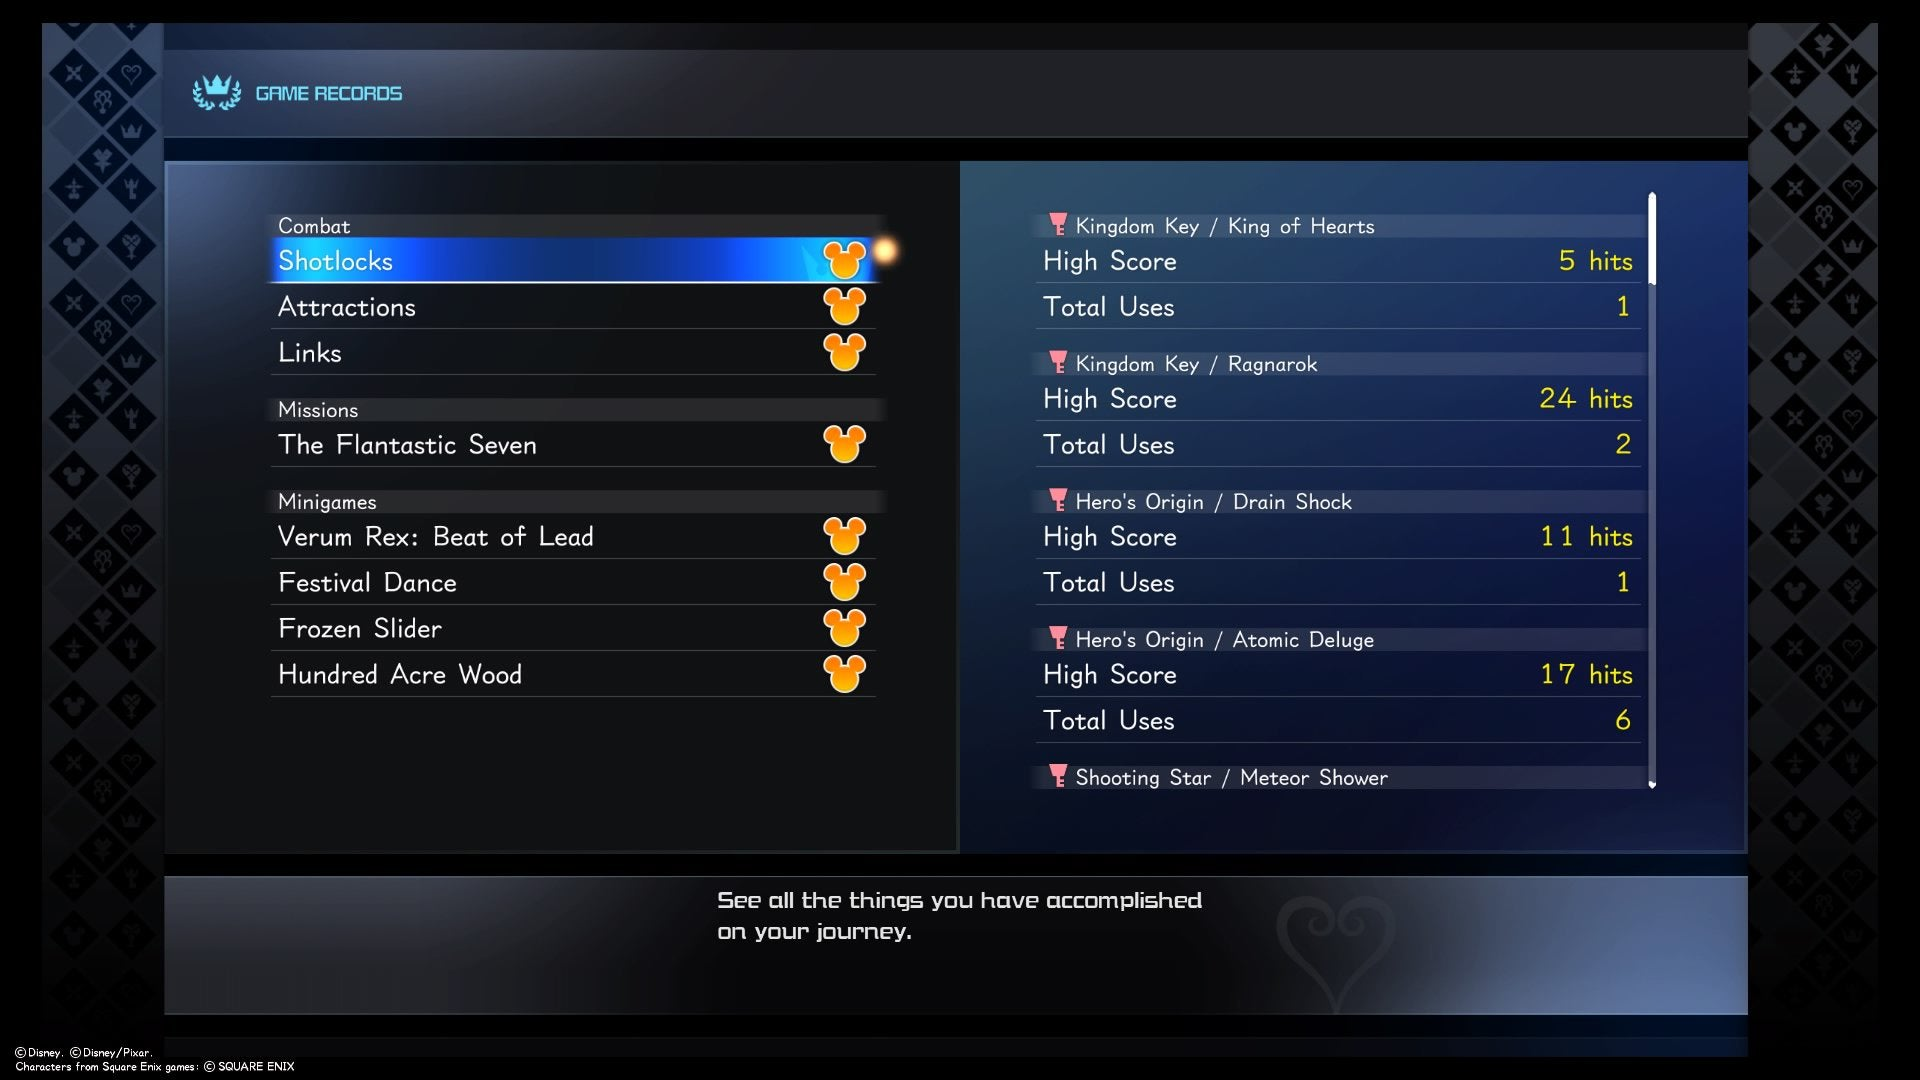 Kingdom Heart 3 Game Records